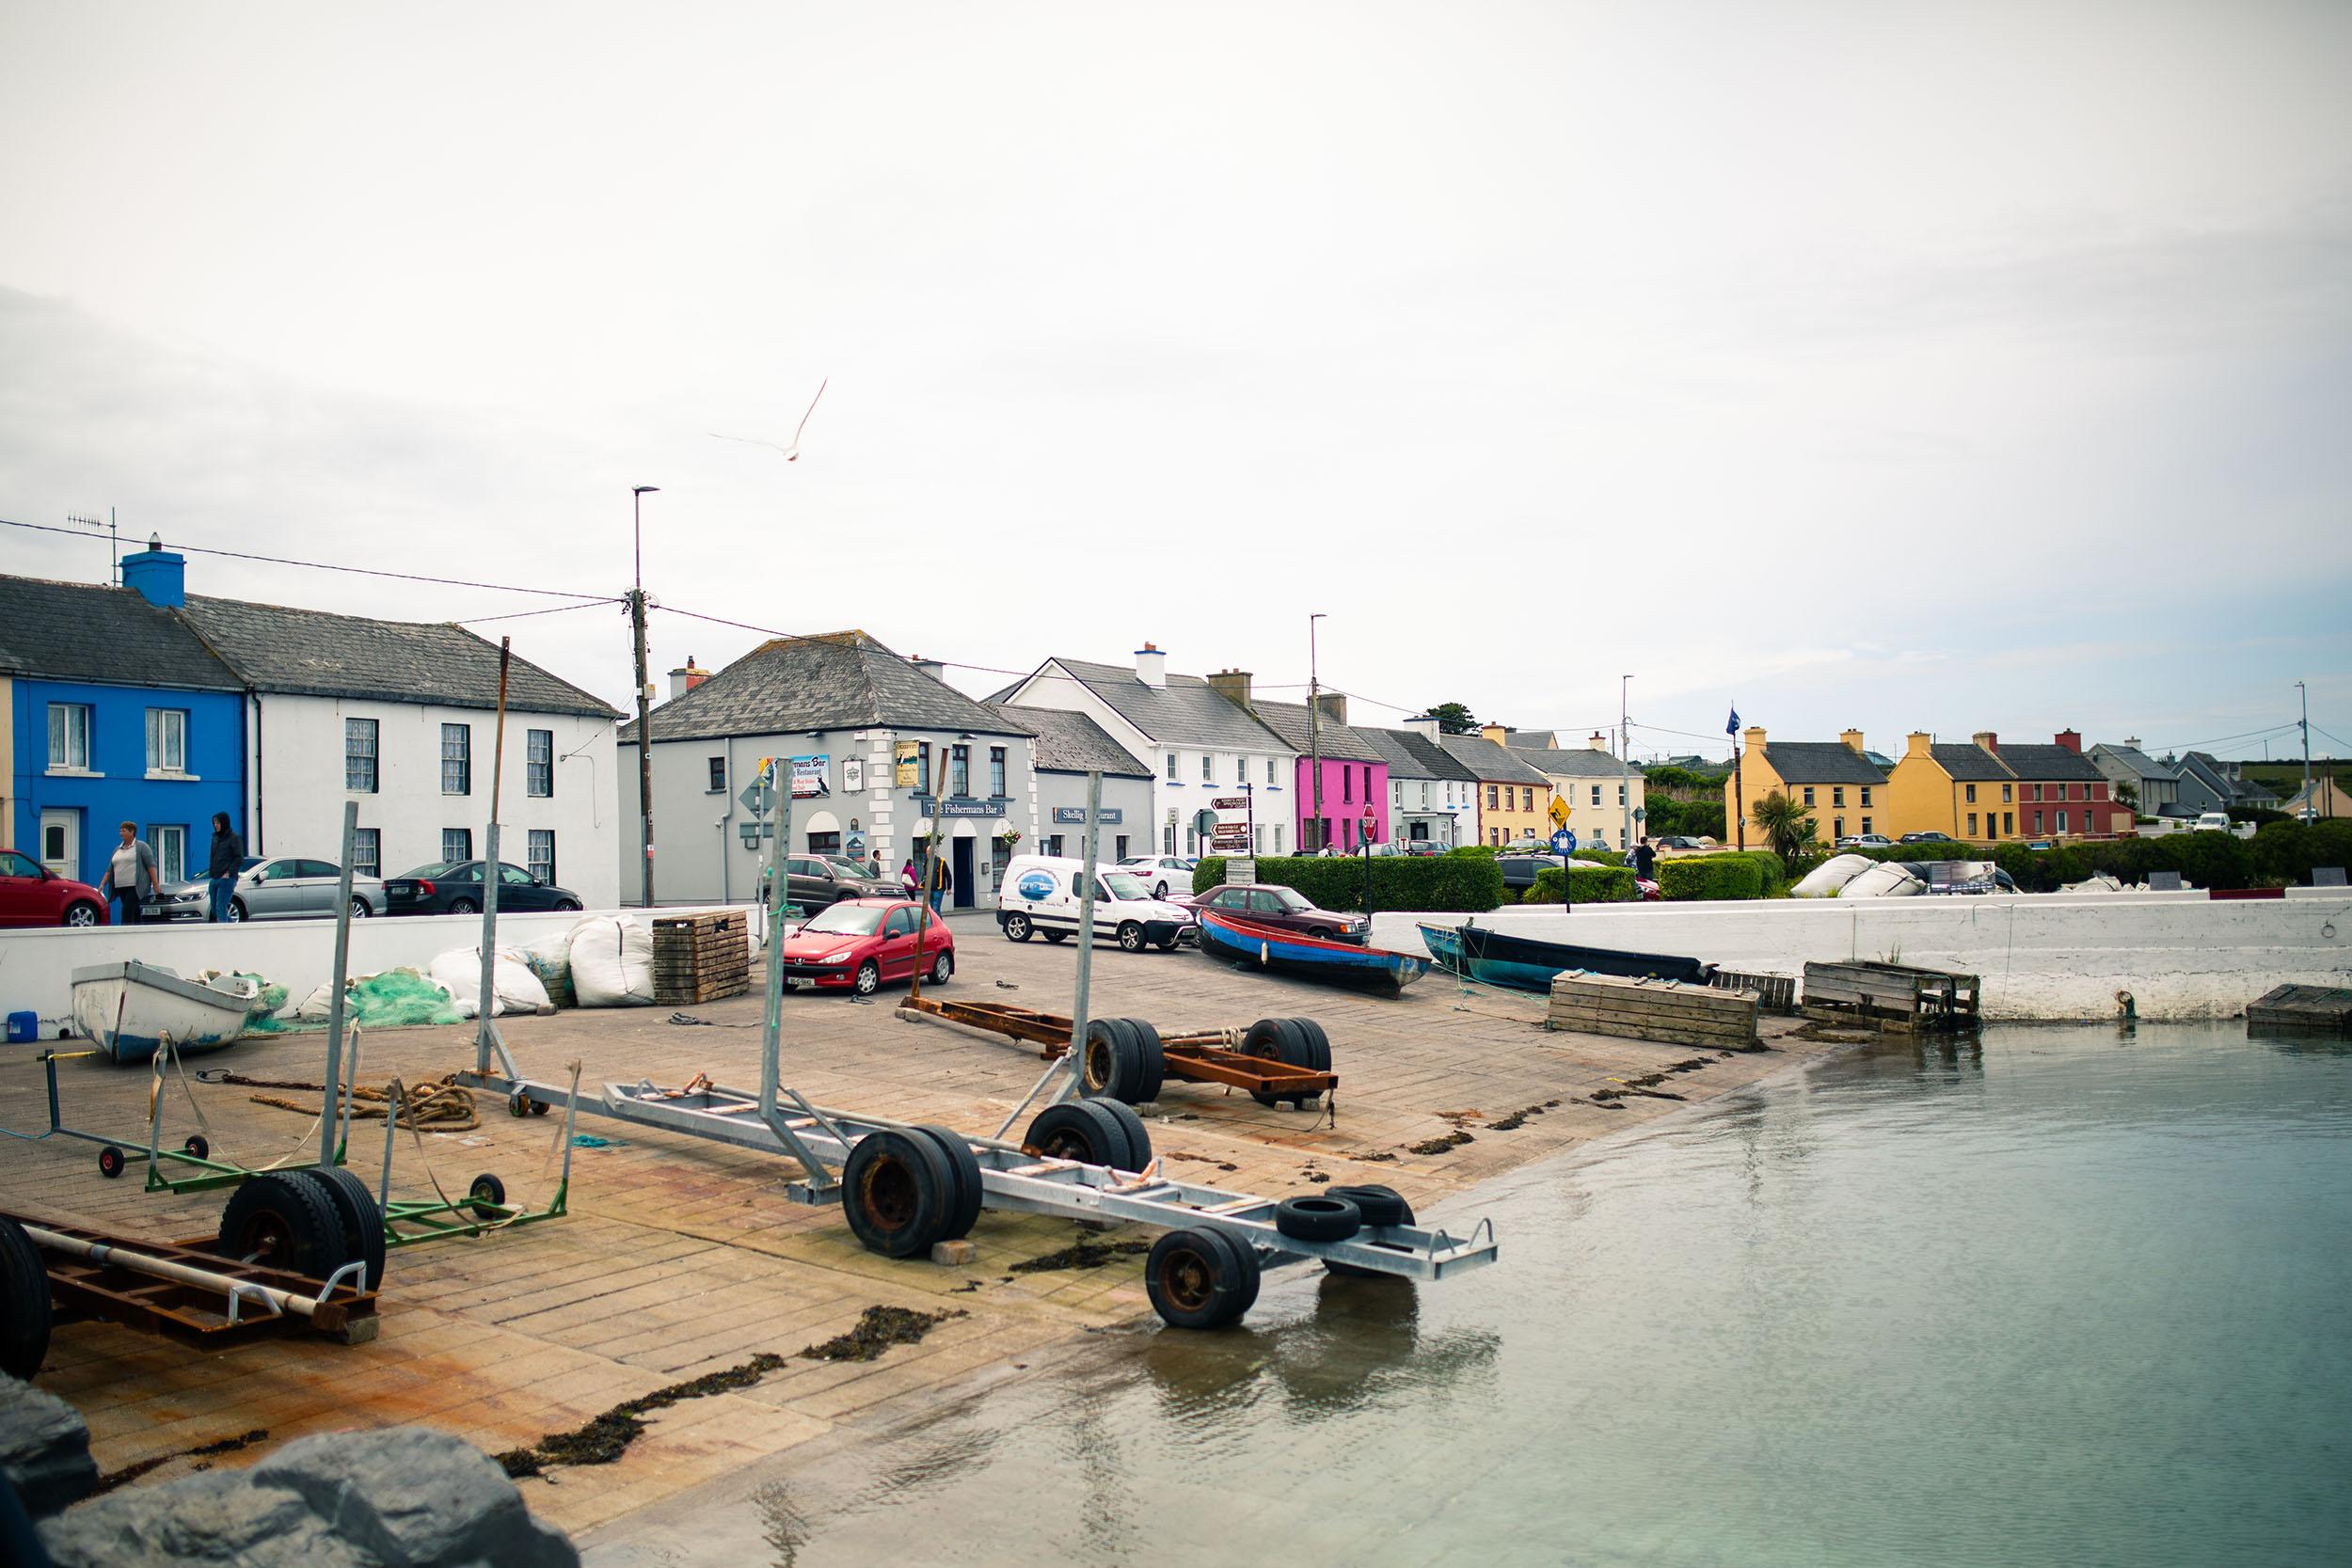 IRELAND_KERRY_PORTMAGEE_0021